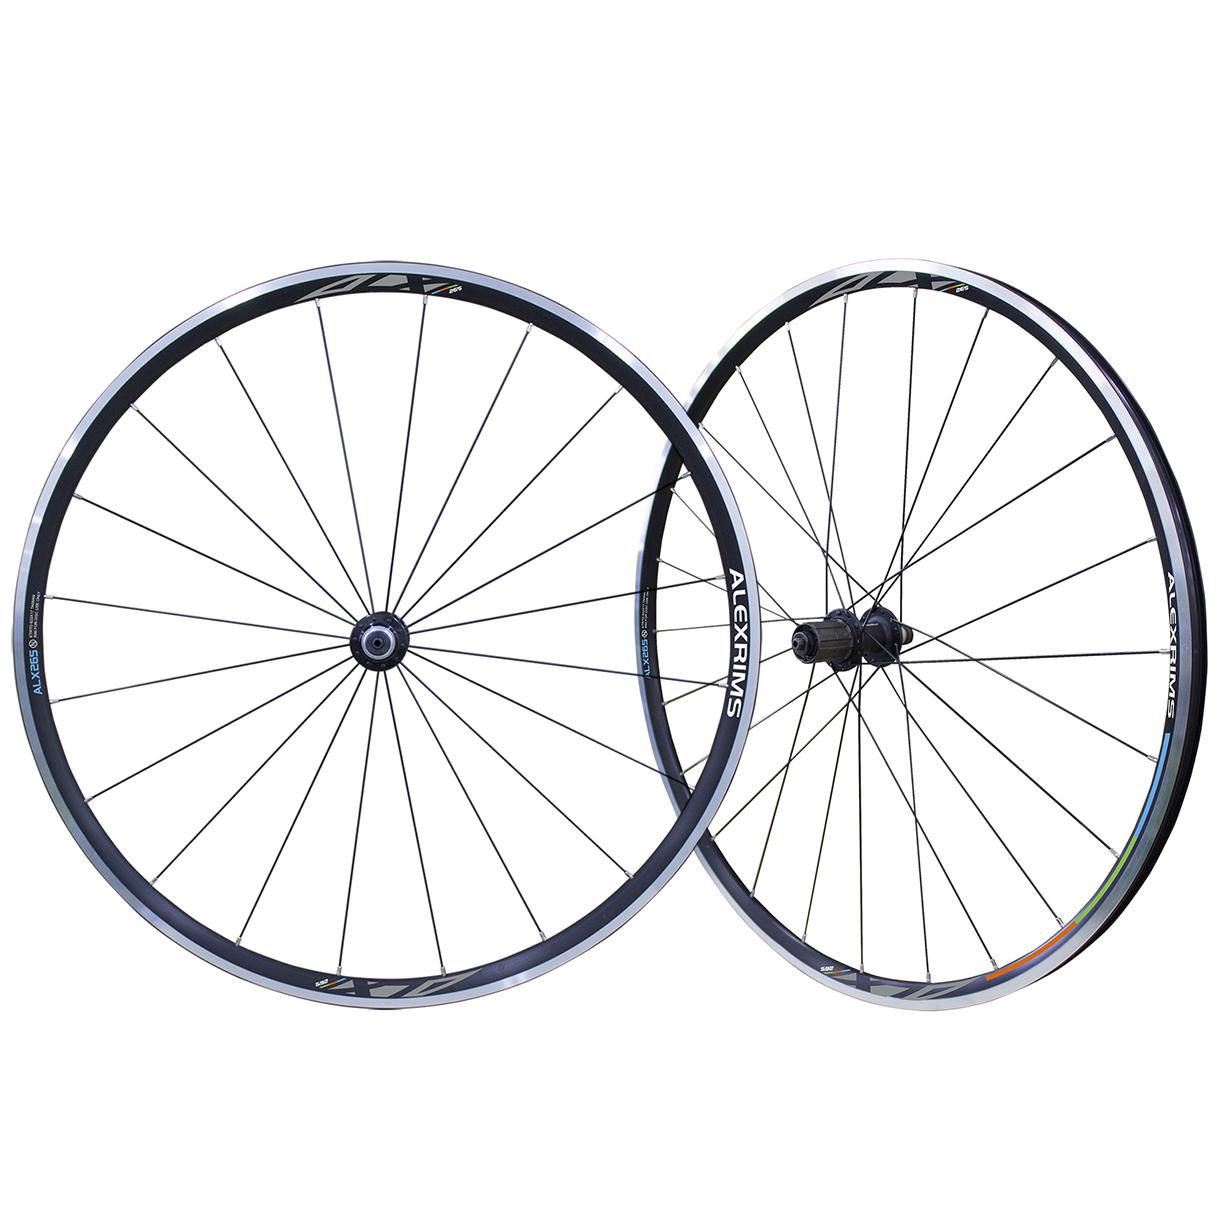 Alex ALX265 TL-Ready Clincher Wheelset - 700c